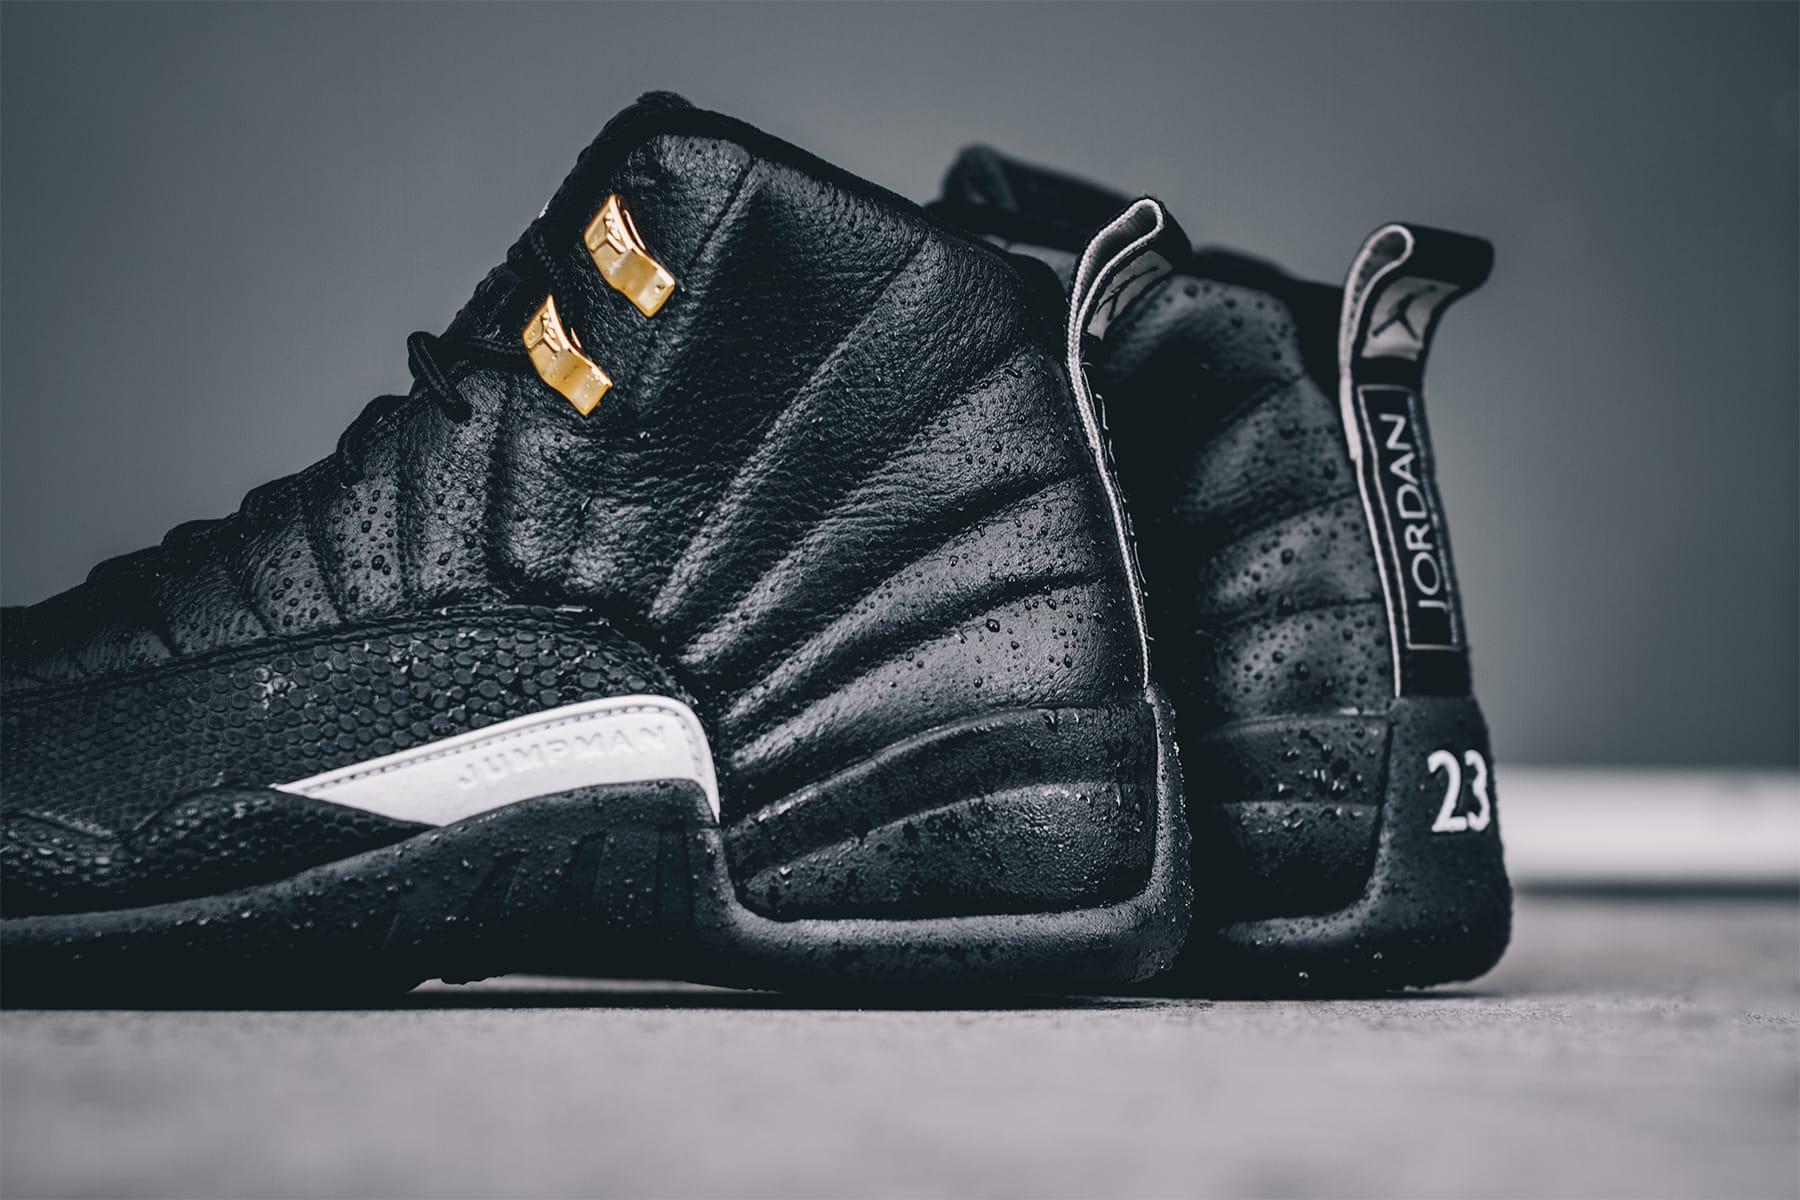 A Closer Look Air Jordan 12 Retro The